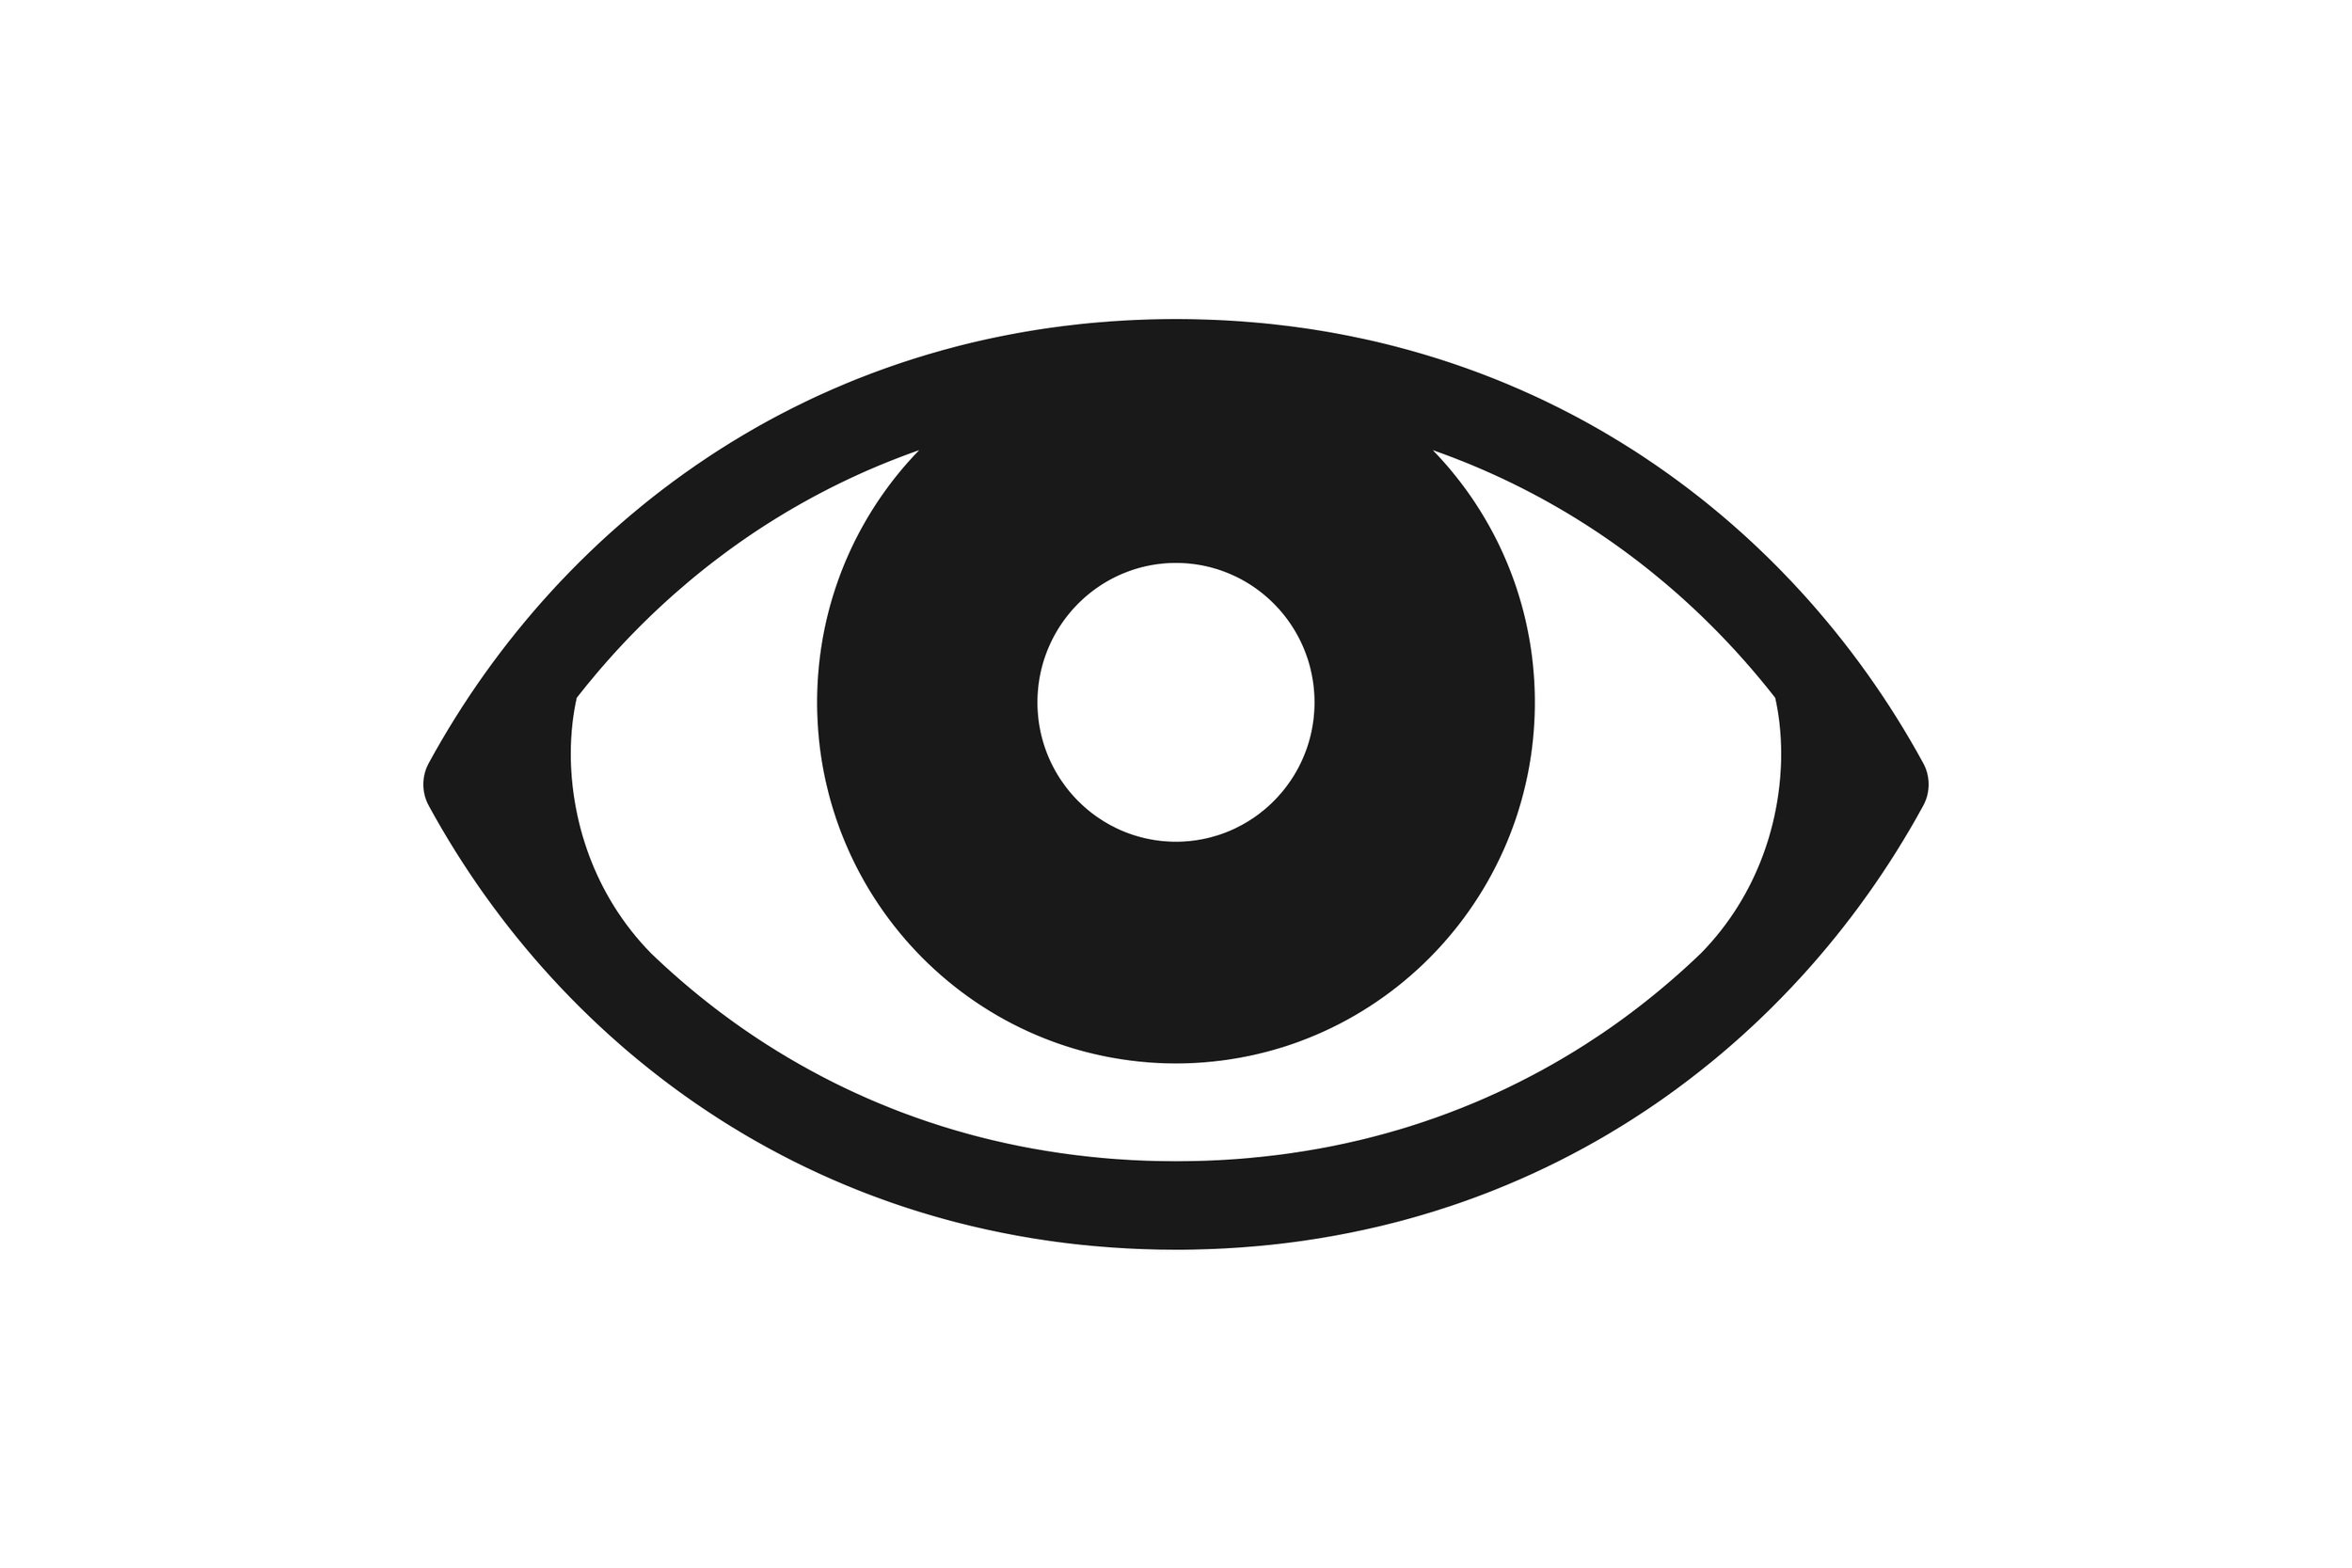 spectra-logo-black.jpg